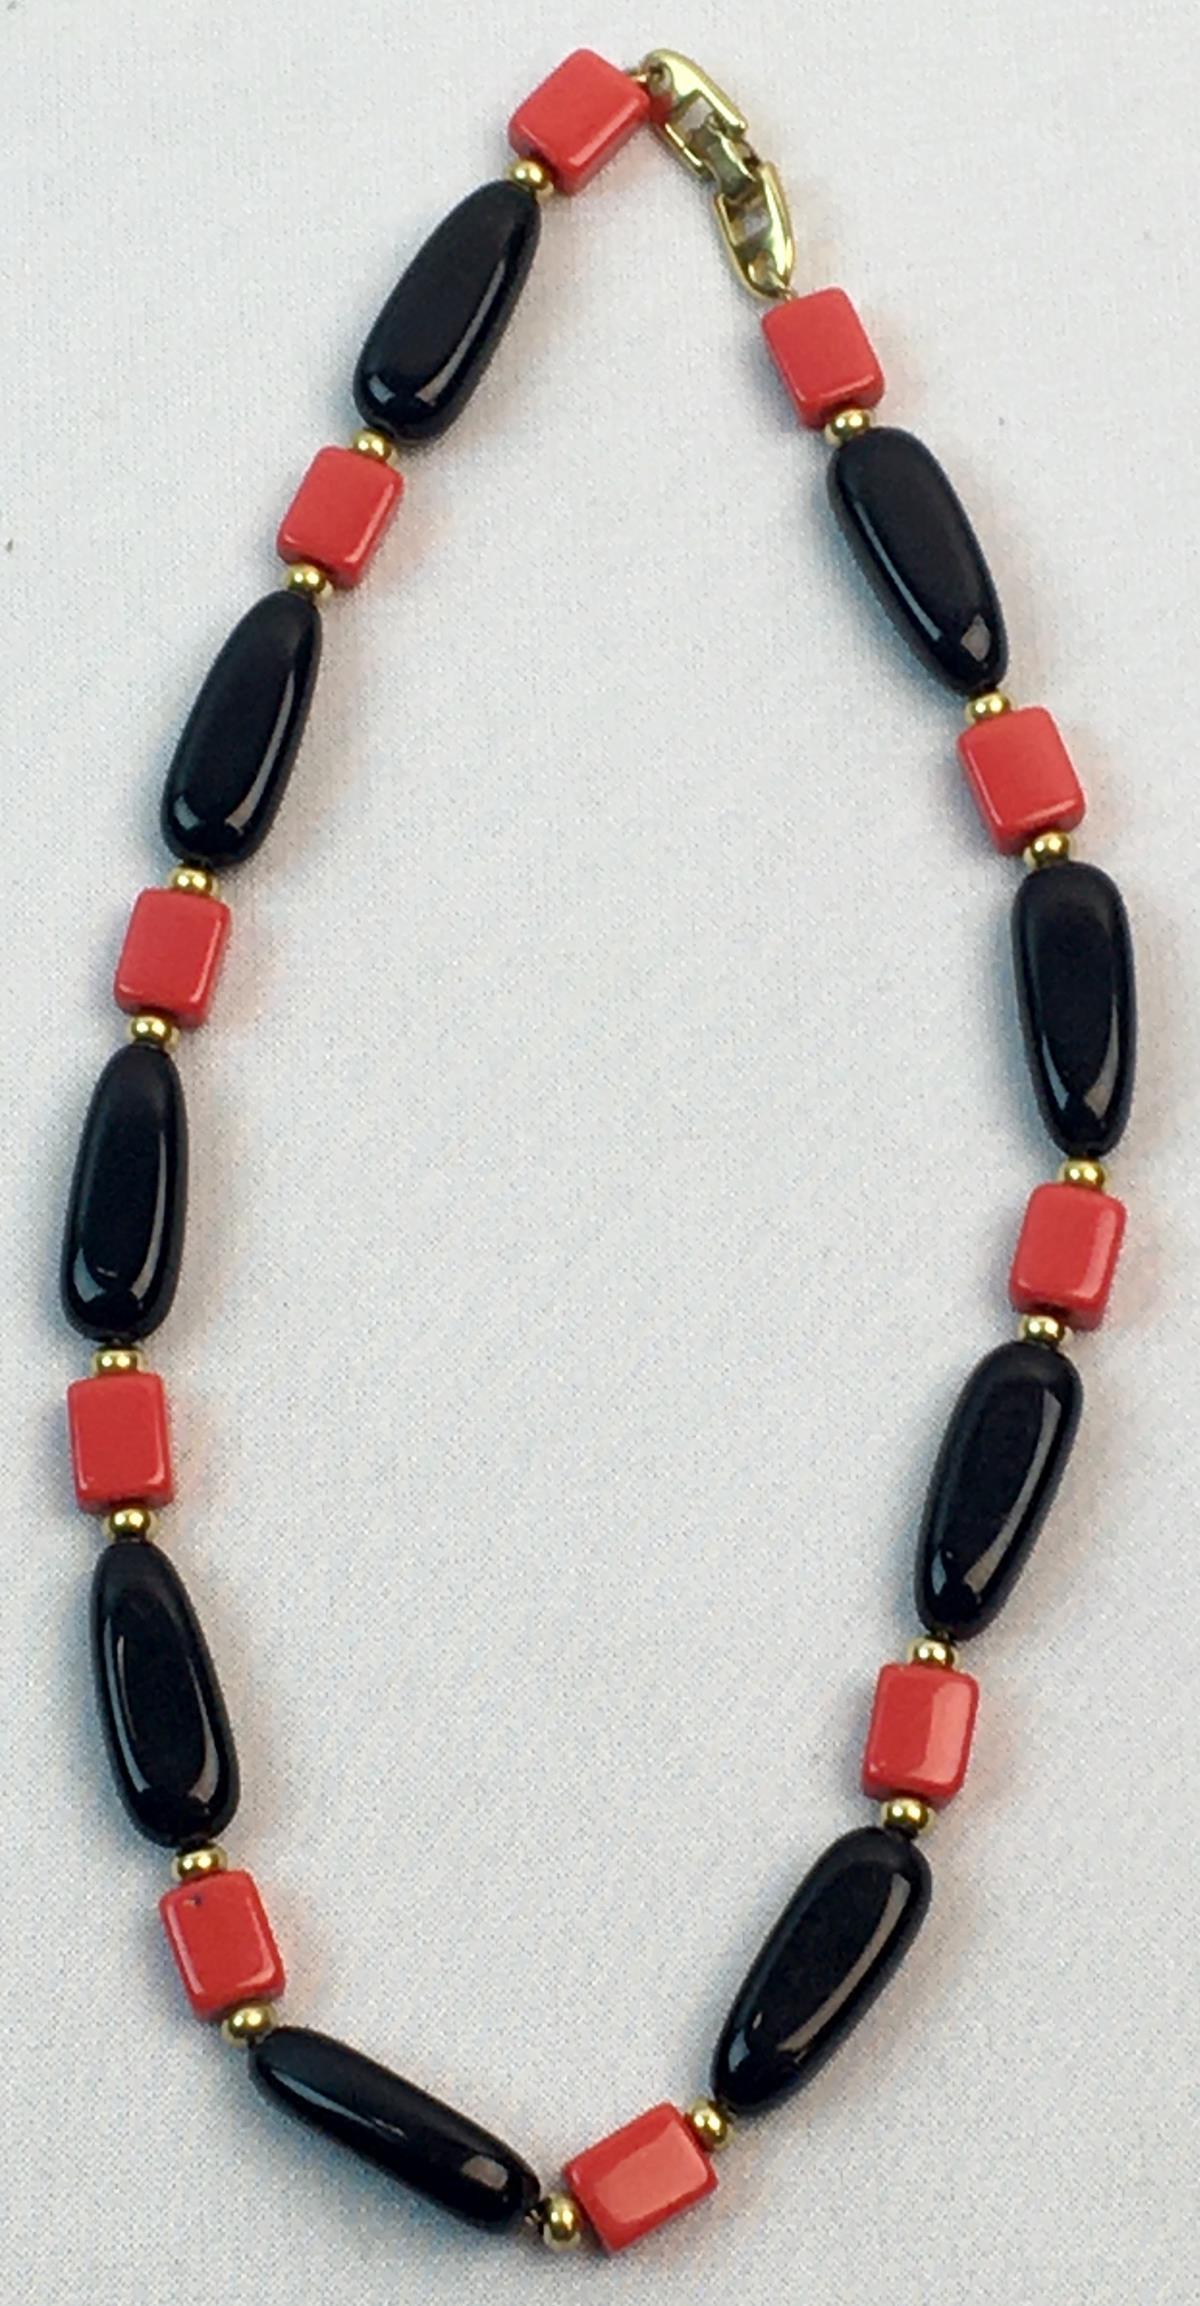 Vintage Signed Napier Black & Red Art Deco Necklace